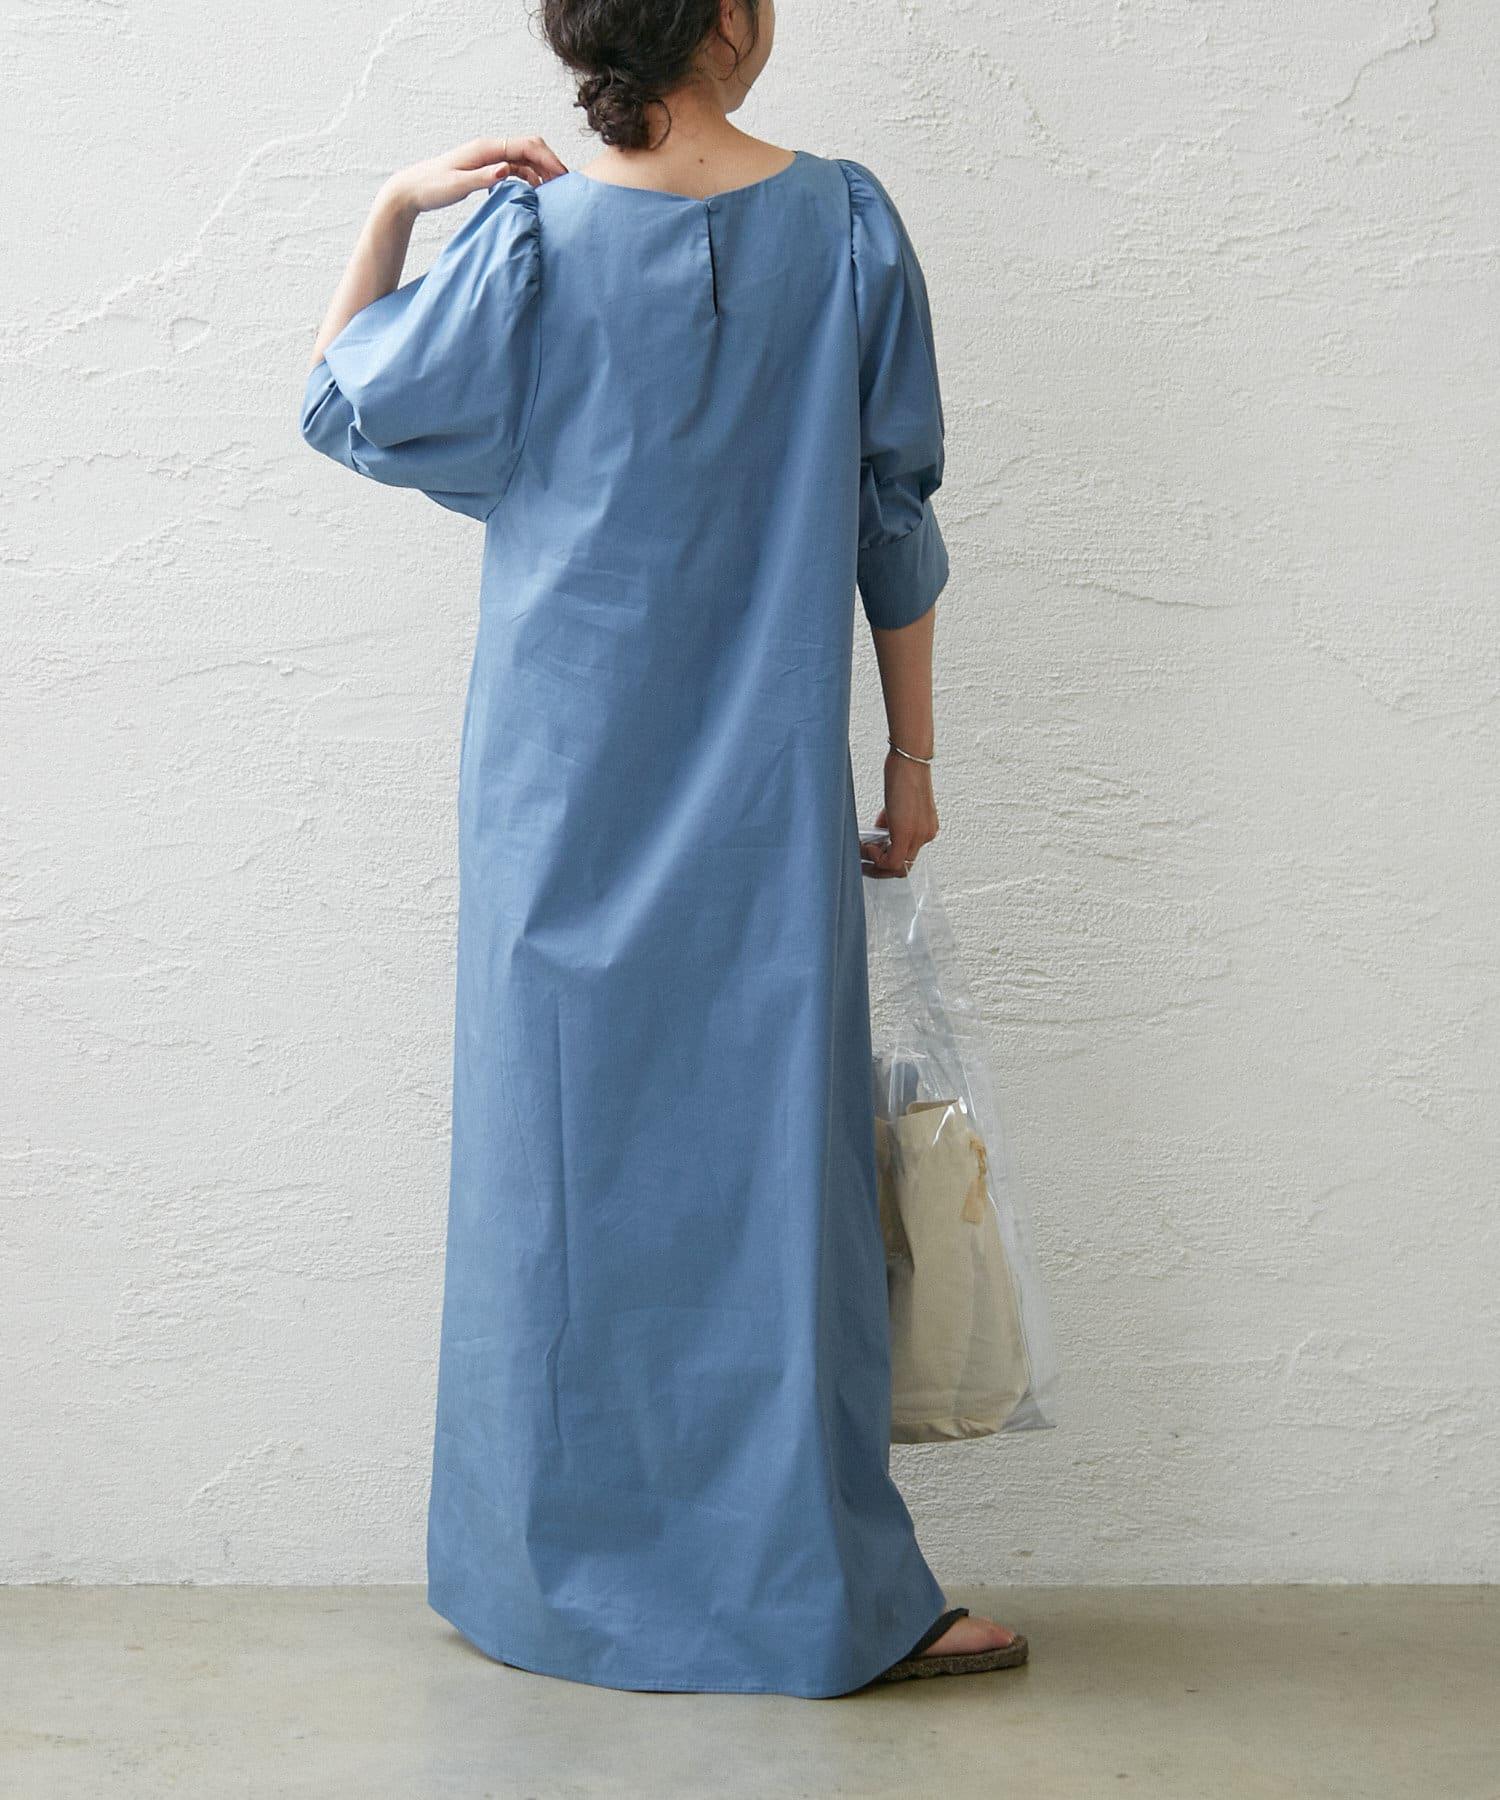 Omekashi(オメカシ) 【新色ブルー】ビッグスリーブワンピース